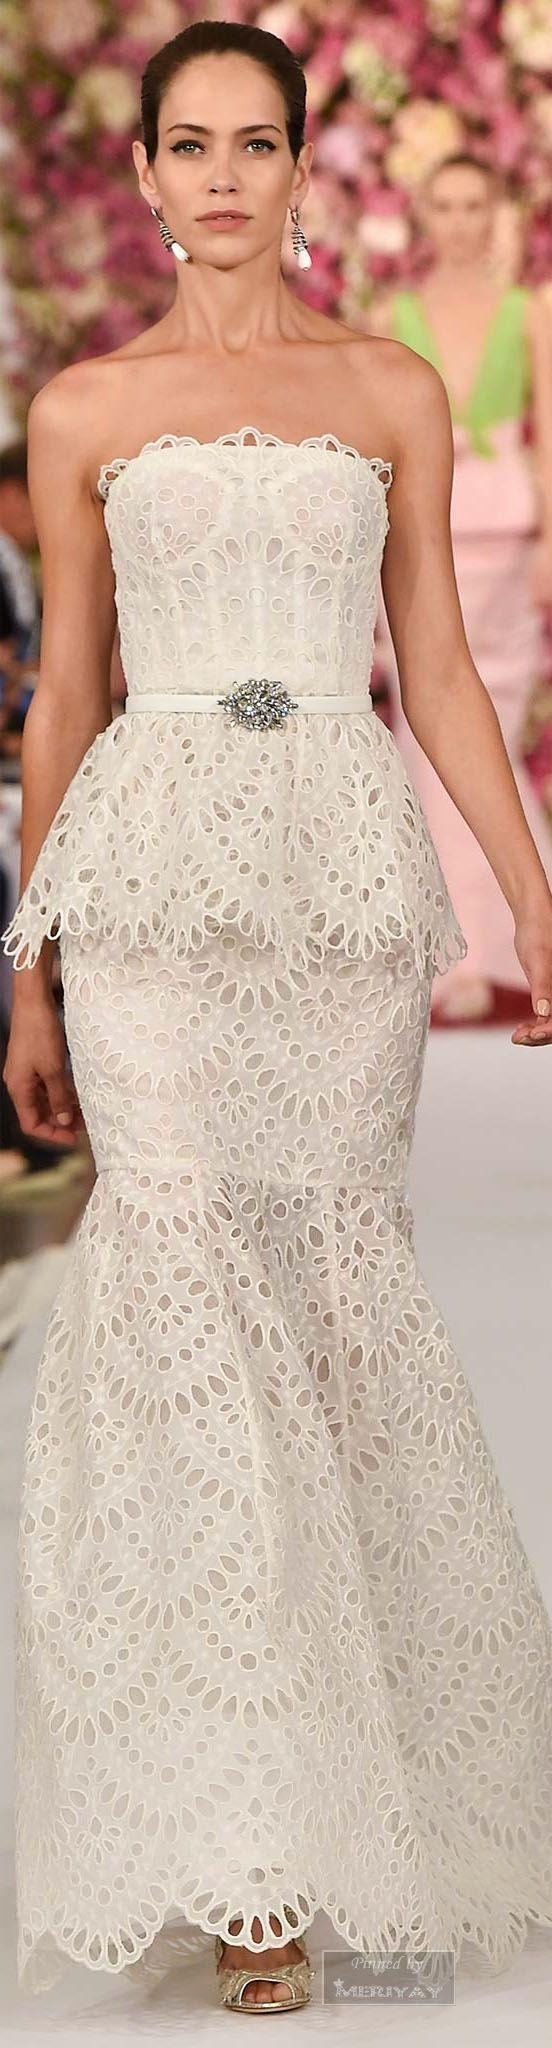 ♥ Couture Spring/Summer 2015~ ♥ ***Oscar de la Renta.Spring 2015***